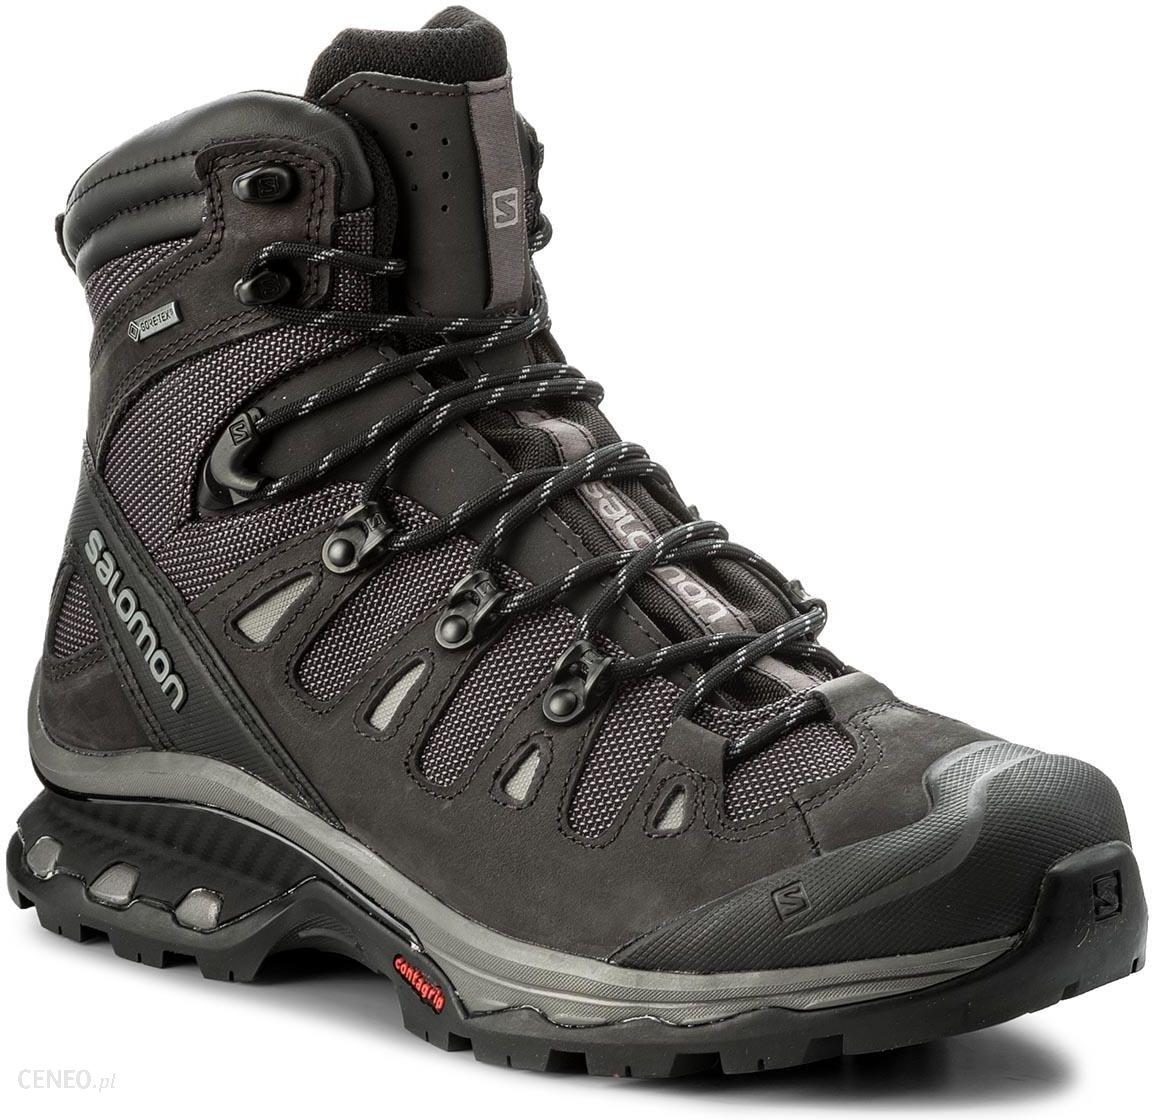 Buty trekkingowe męskie SALOMON QUEST 4D 3 GTX GORE TEX (402455)